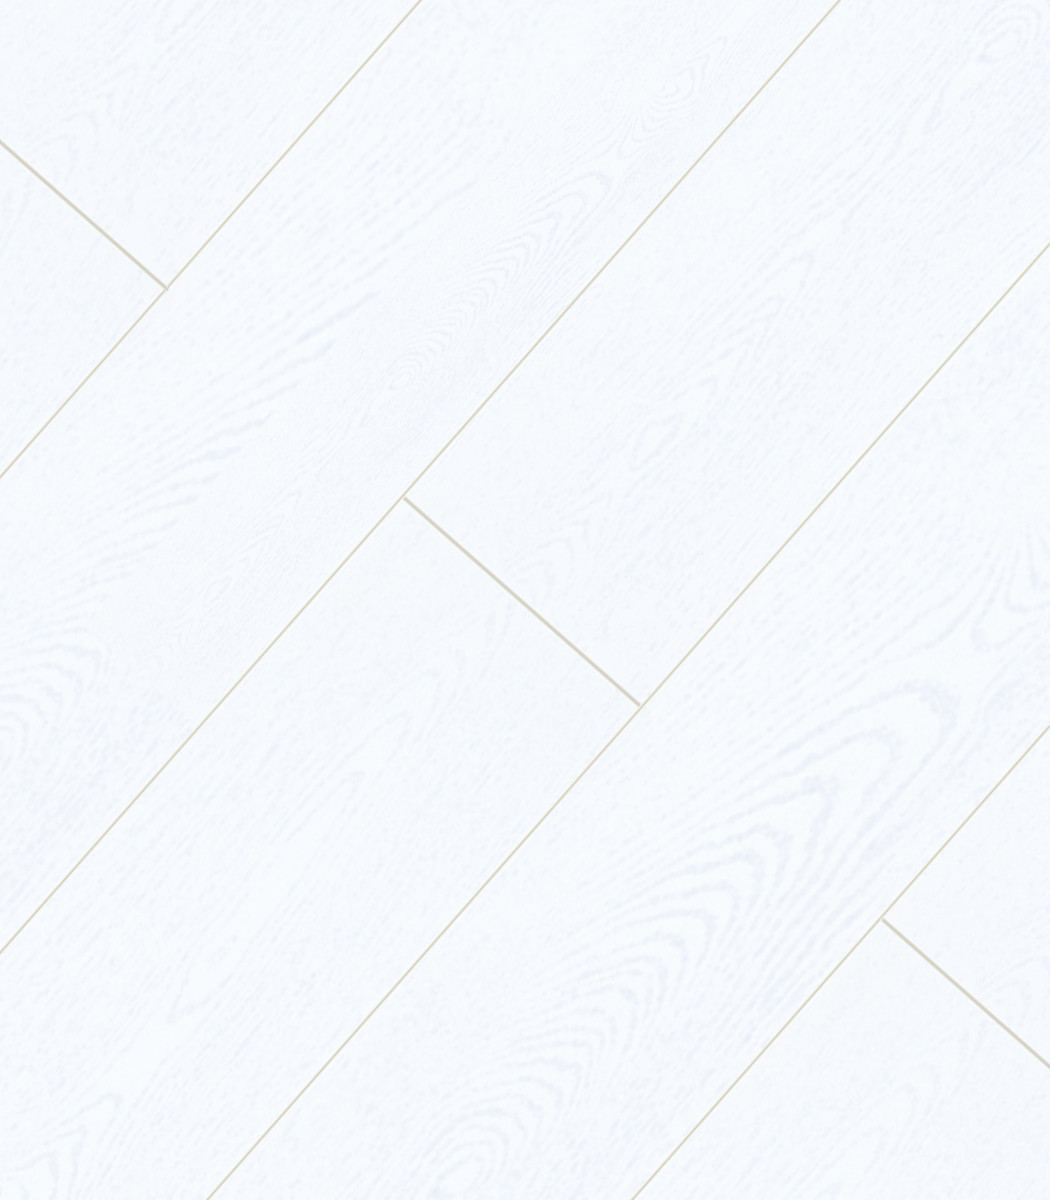 Ламінована підлога Artfloor Opak Byz / 32 кл.